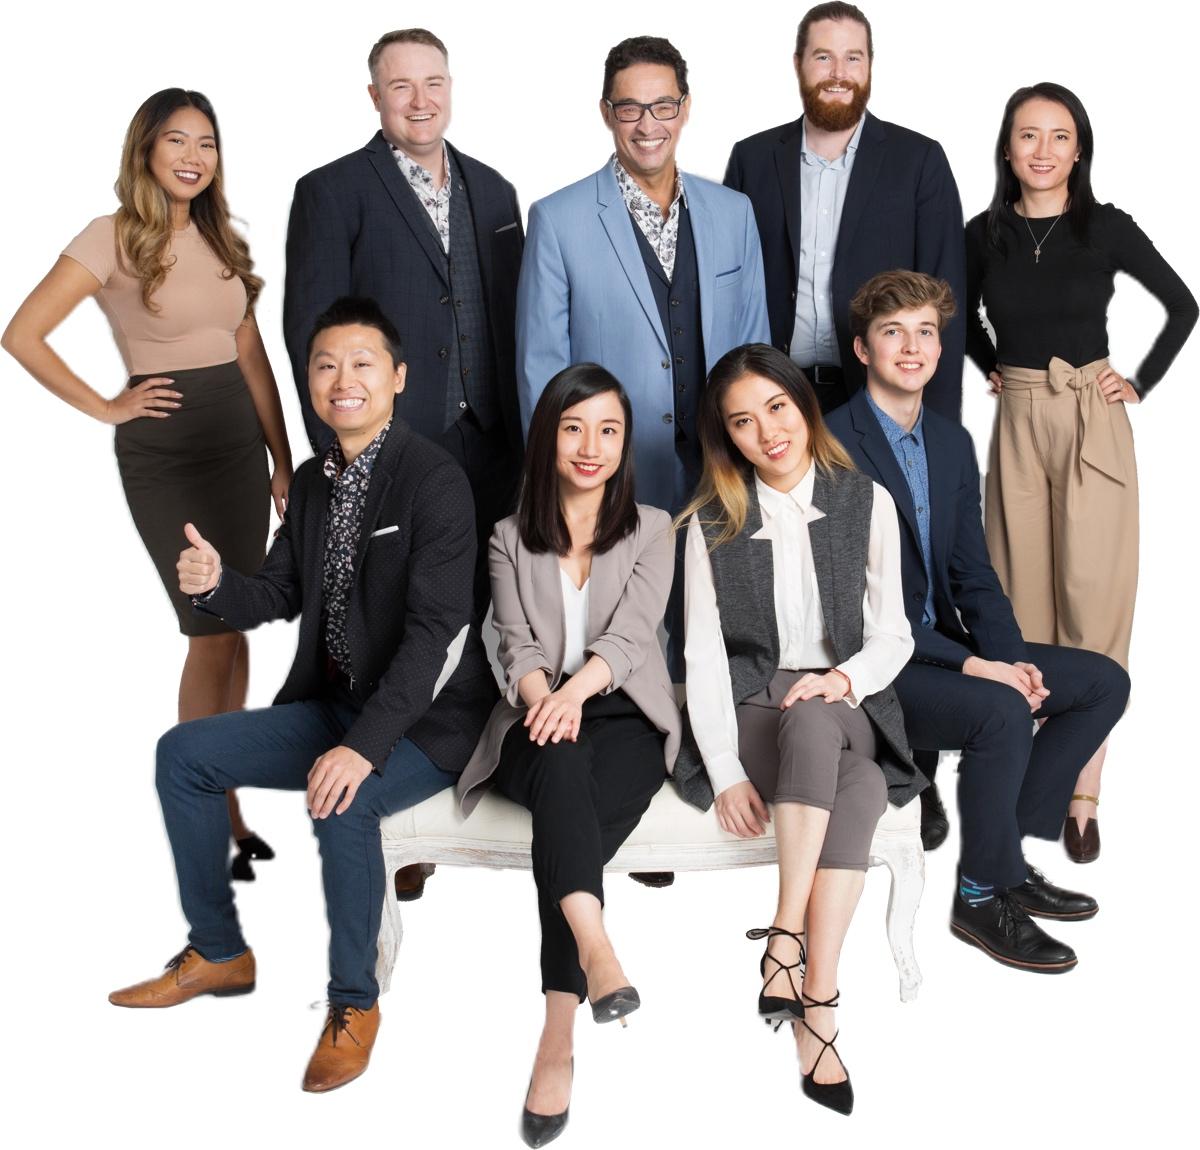 Genesa team photo